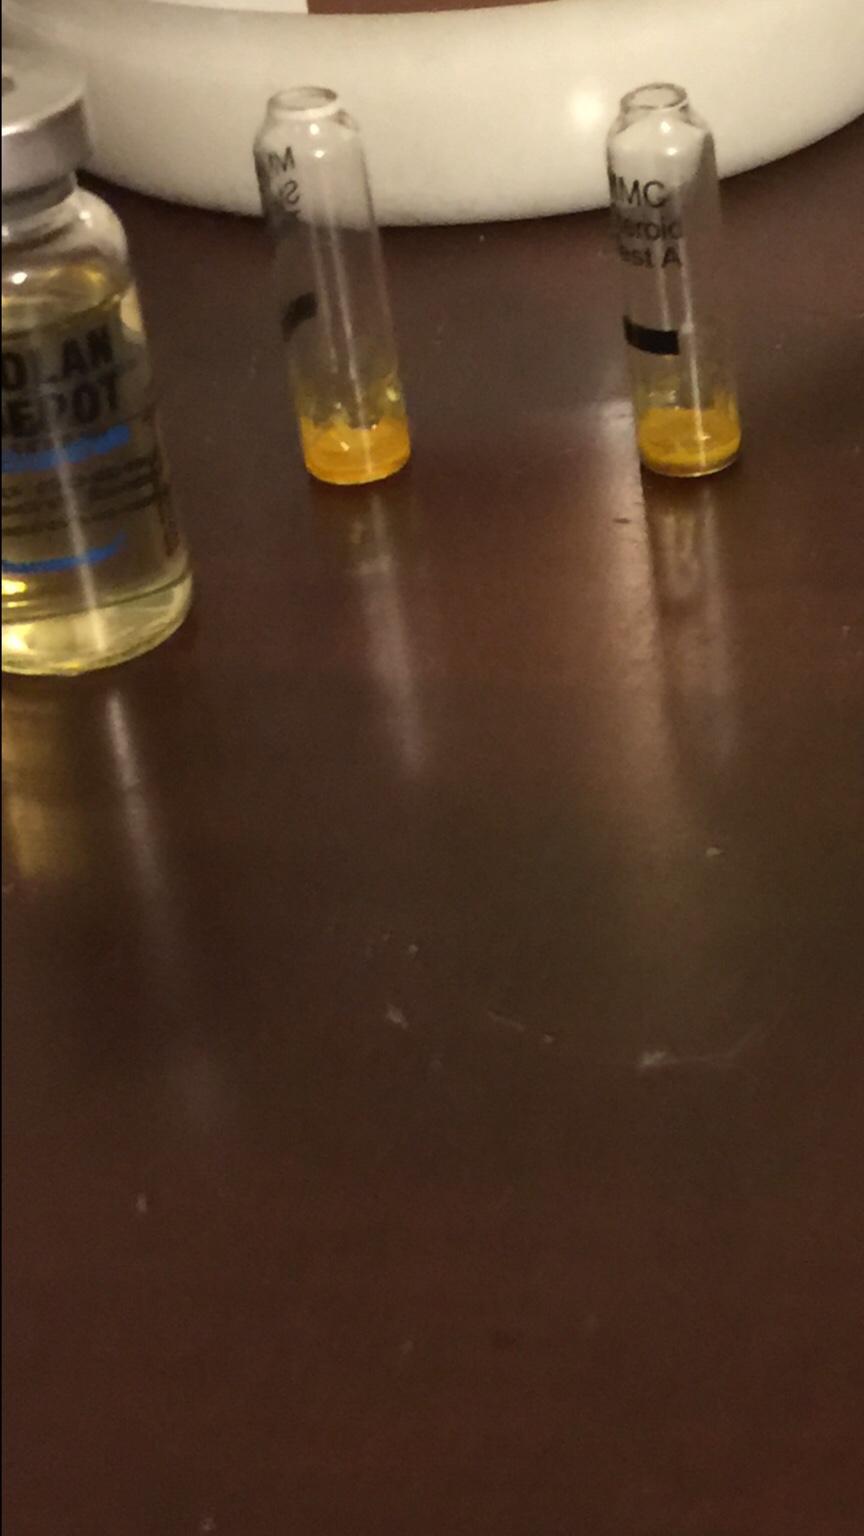 primobolan labmax